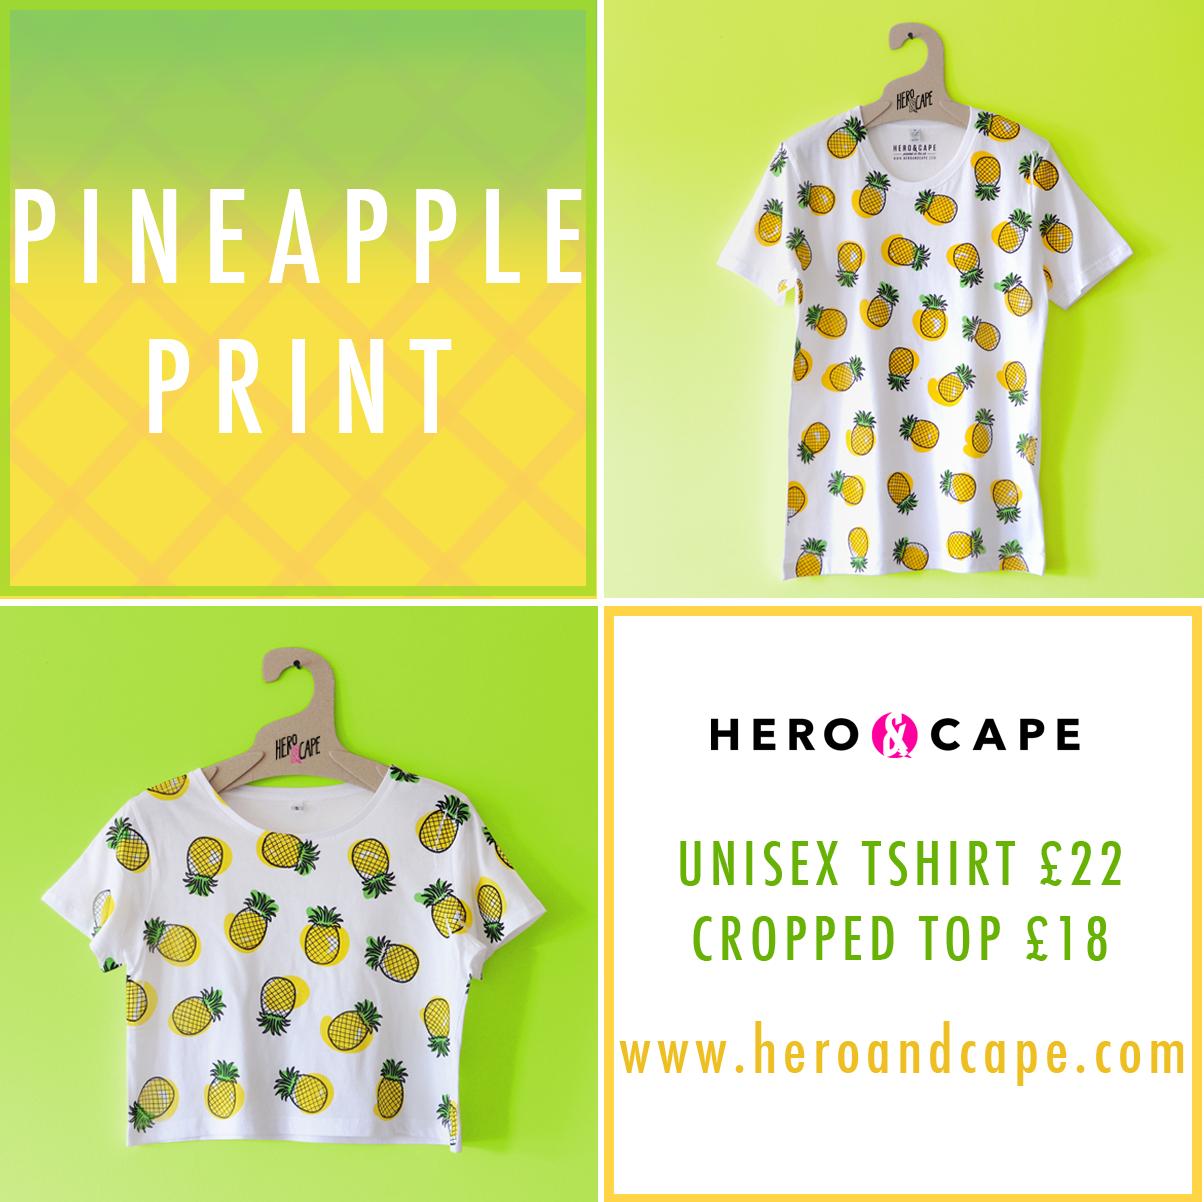 pineapple tshirt, pineapple print tshirt, pineapple pattern top